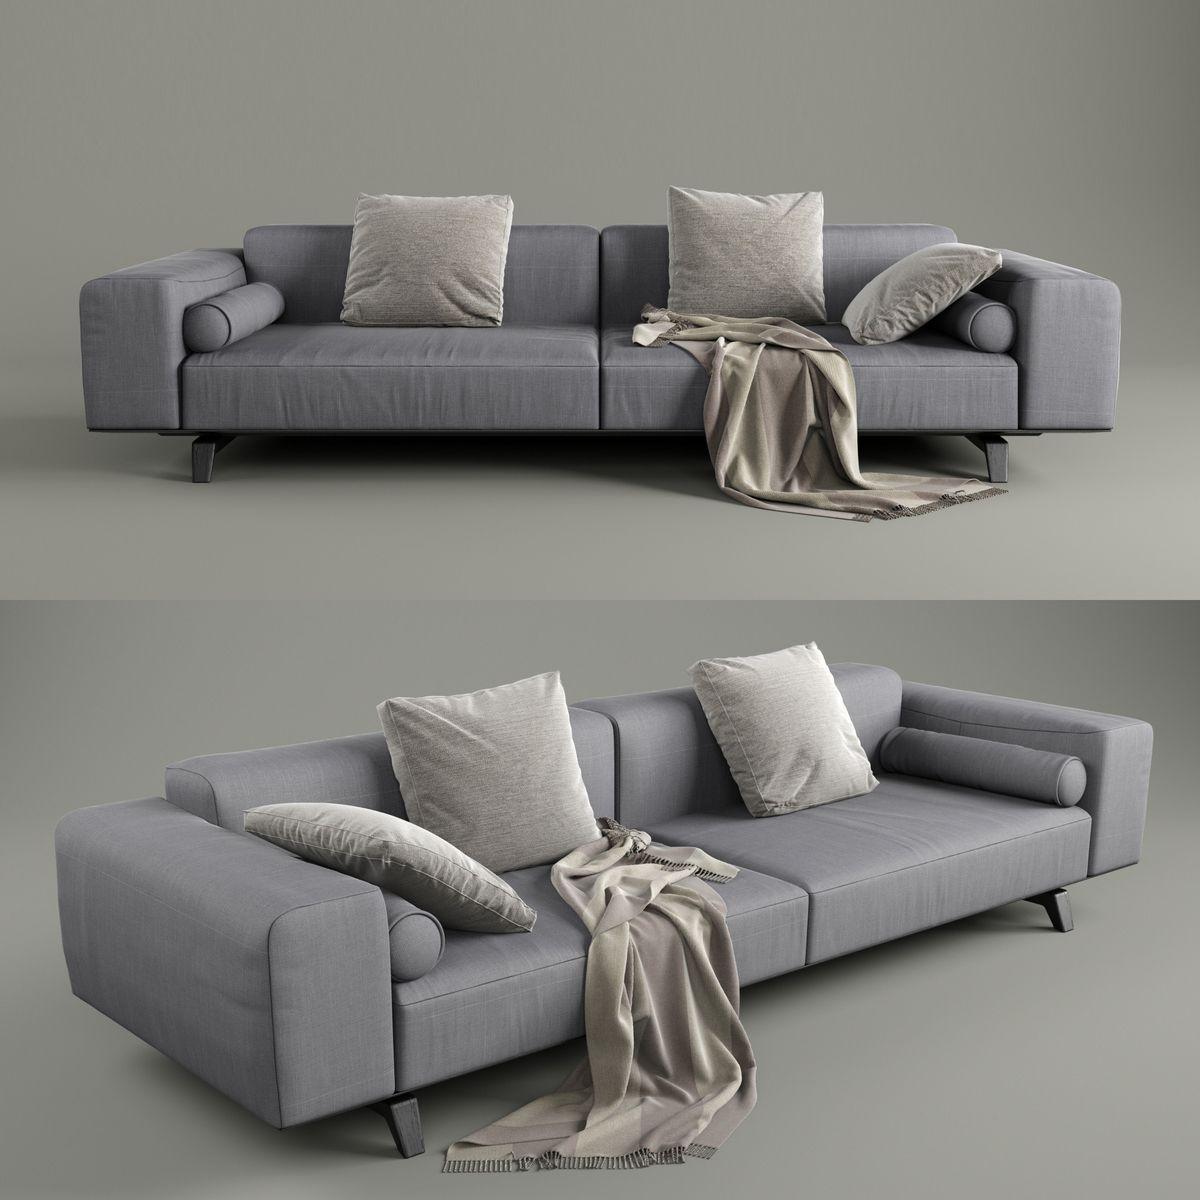 Sofa2 3d Model Download Royalty Free Interior Furniture 3d Models 3d Squirrel Sofa Interior Furniture Furniture